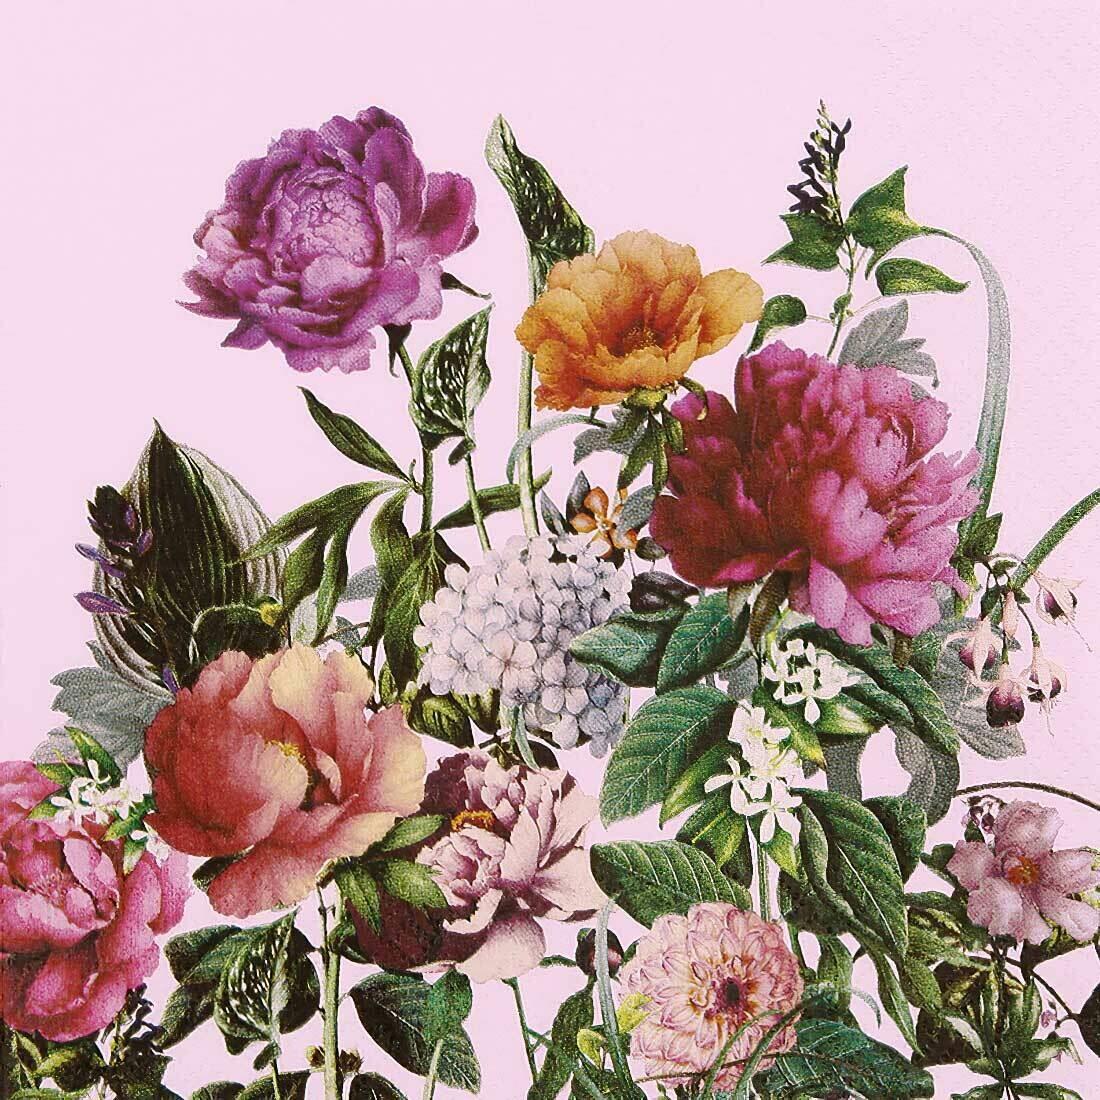 Decoupage Paper Napkins - Floral - Bloom (1 Sheet)